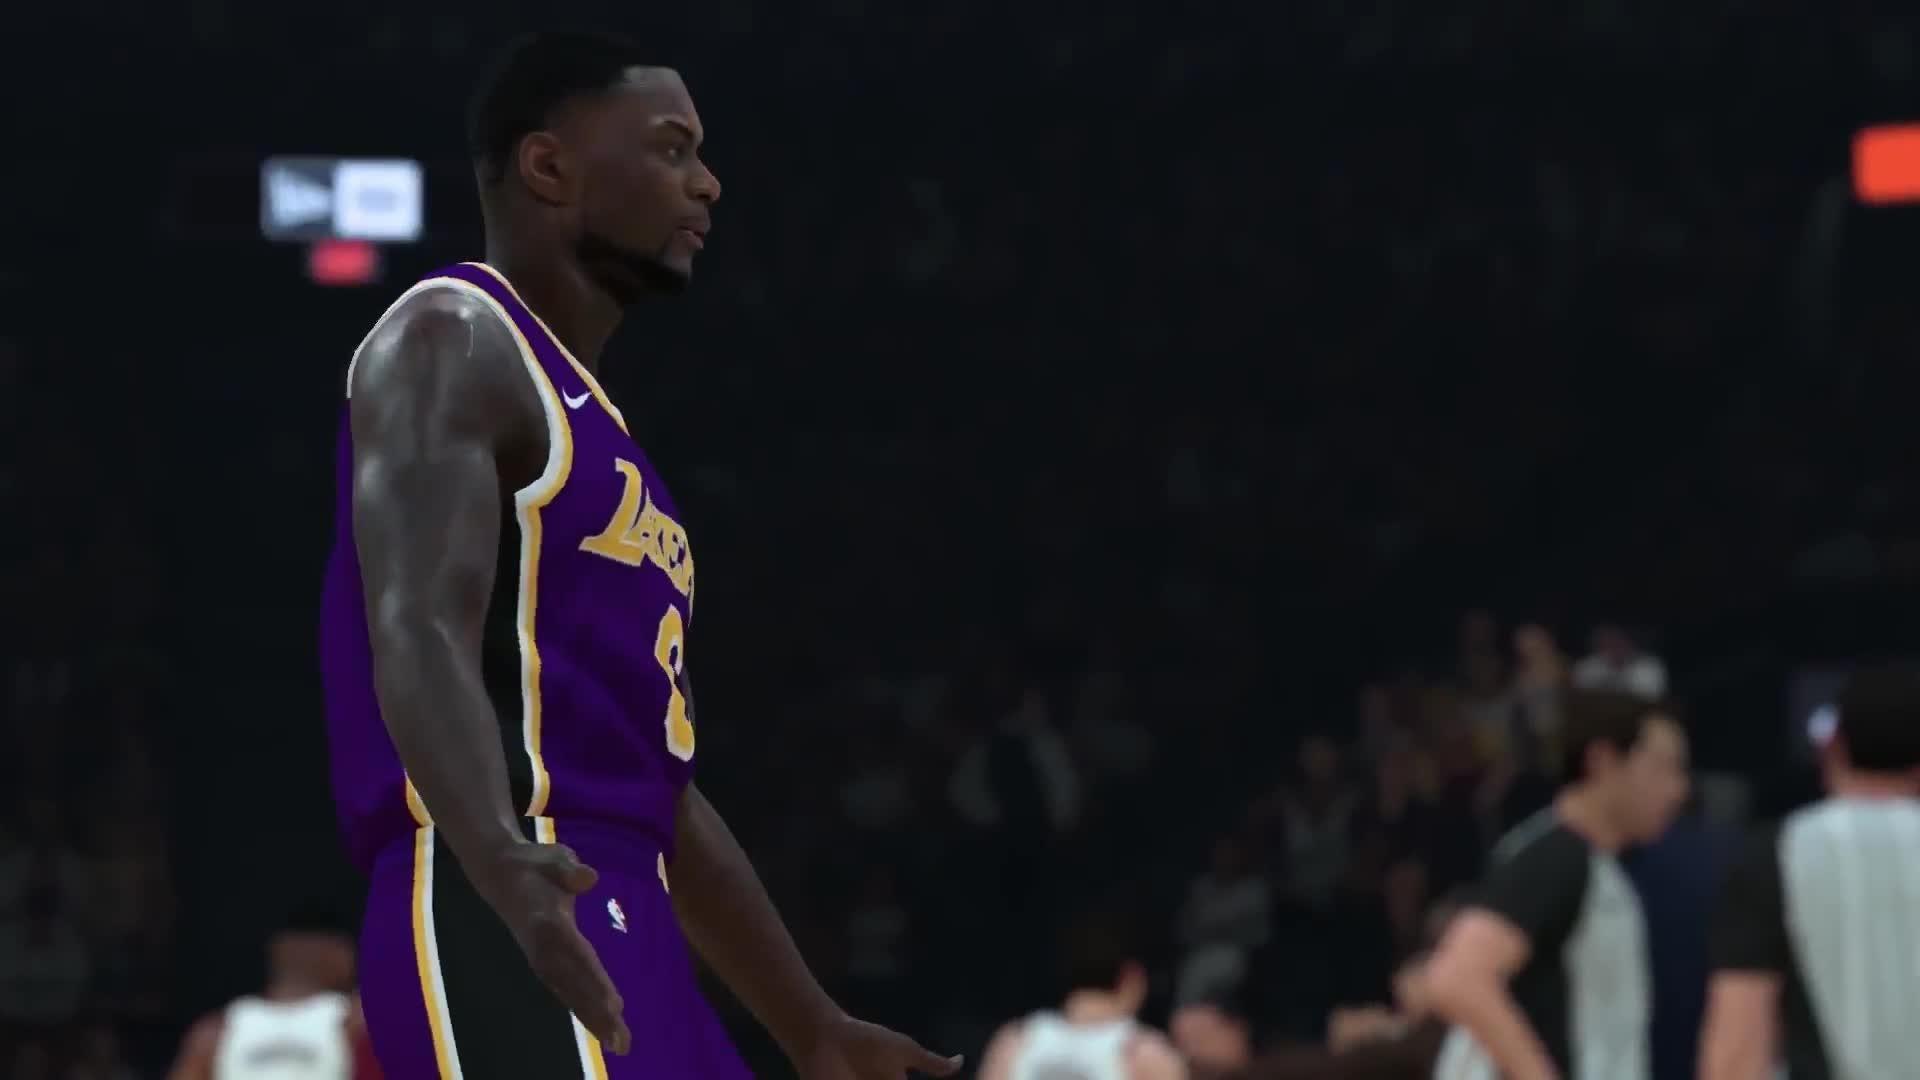 NBA 2K19 Momentous Trailer screen capture